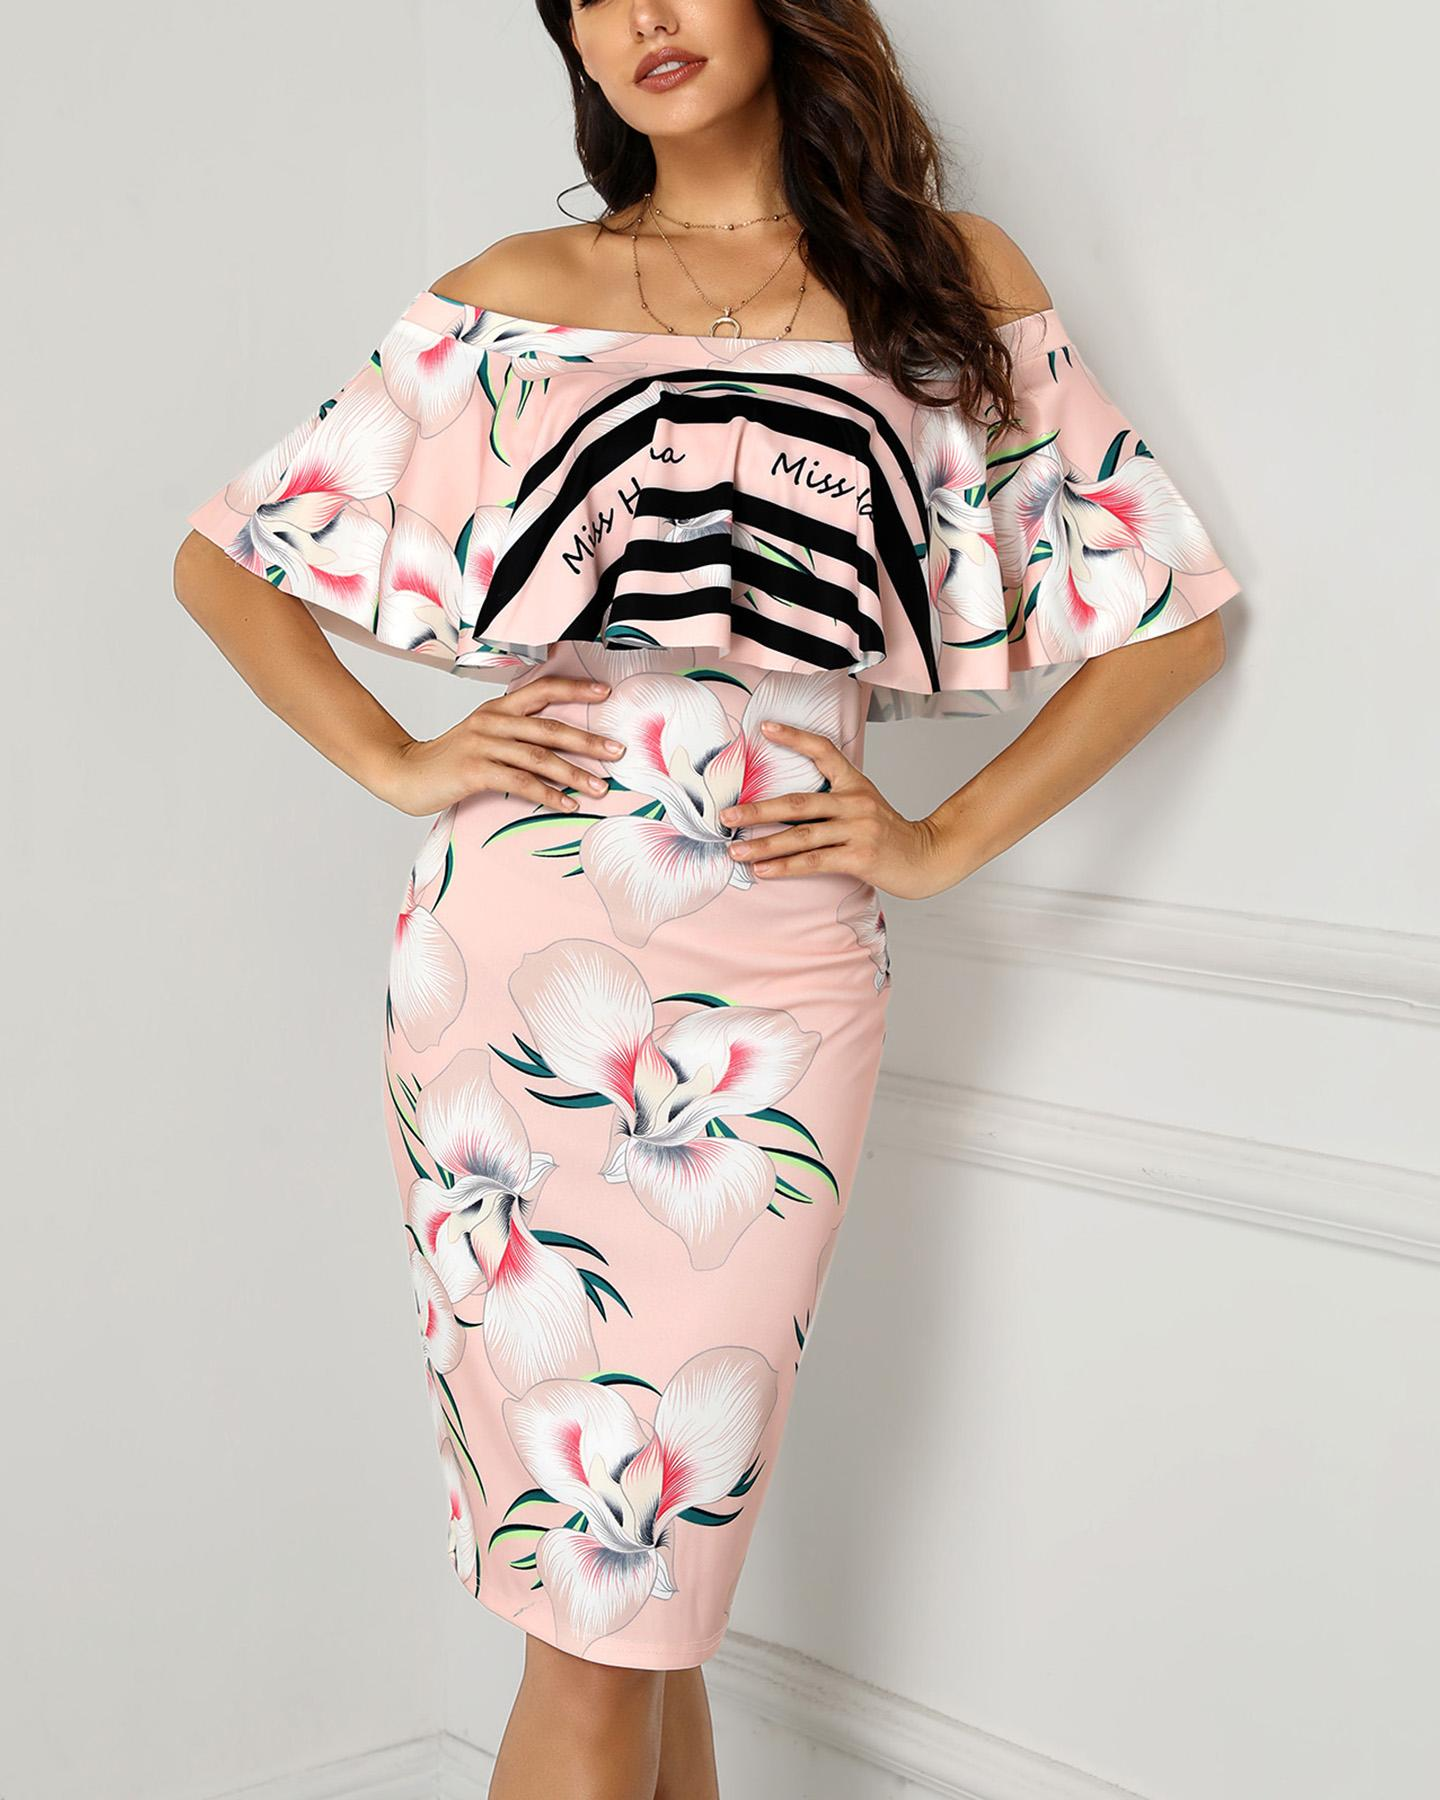 Floral Print Off Shoulder Bodycon Dress